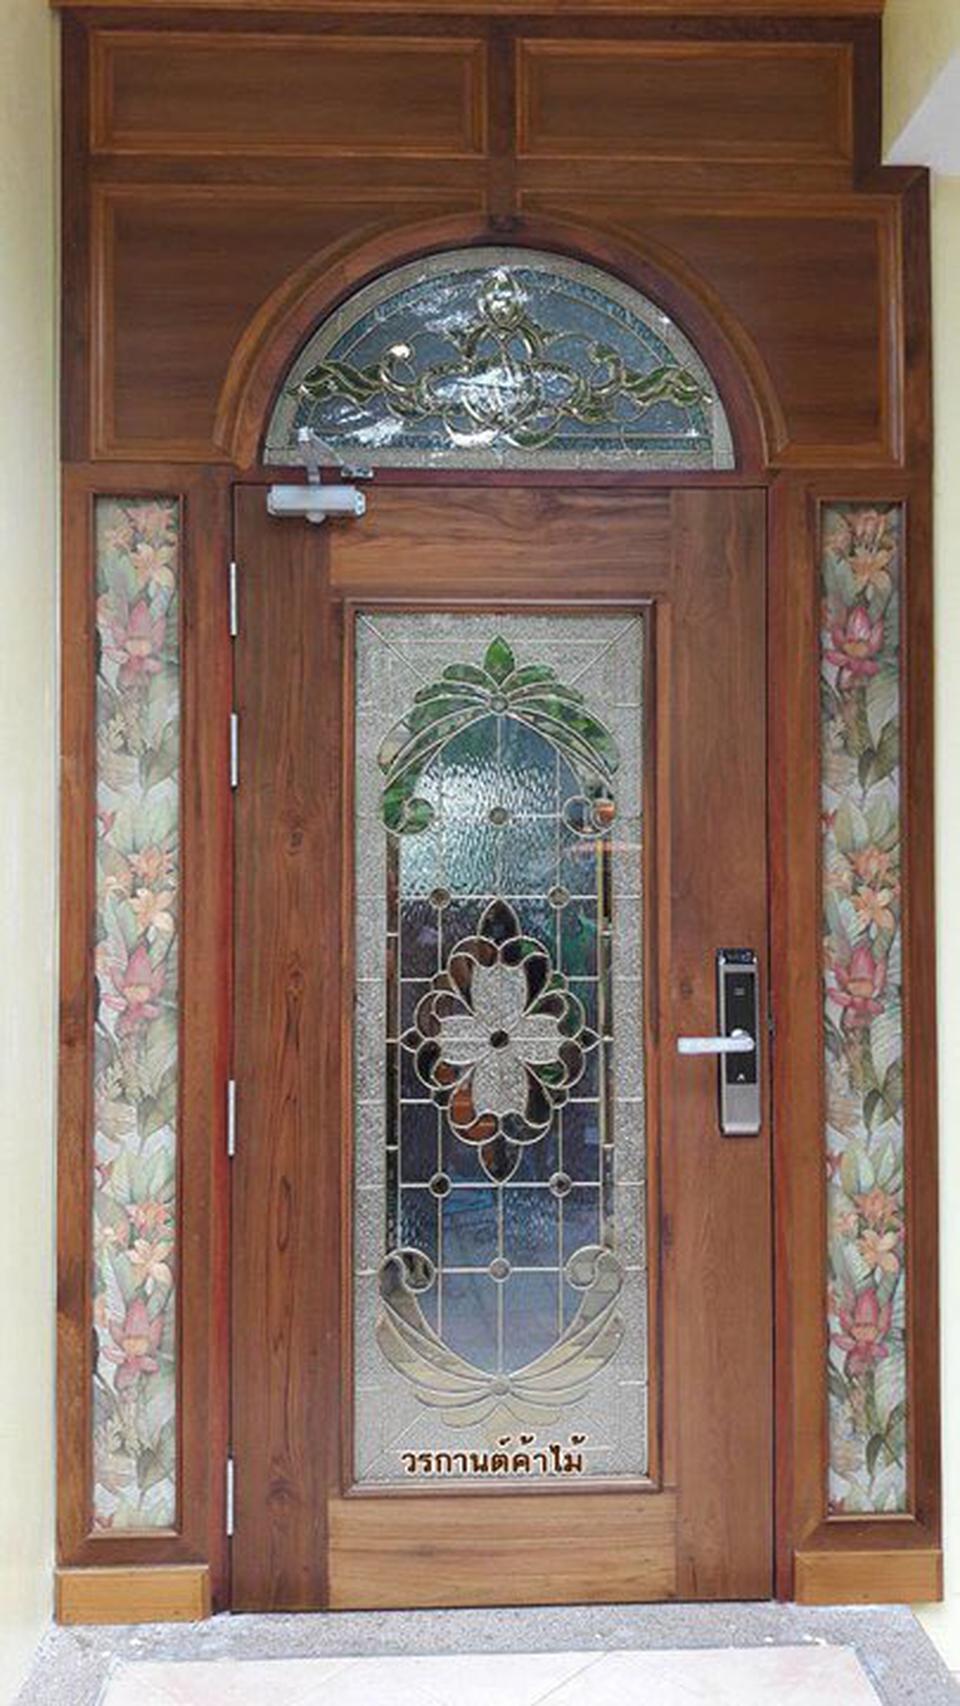 door-woodhome จำหน่ายประตูไม้สัก,ประตูไม้สักกระจกนิรภัย,ประตูไม้สักบานคู่ รูปที่ 3